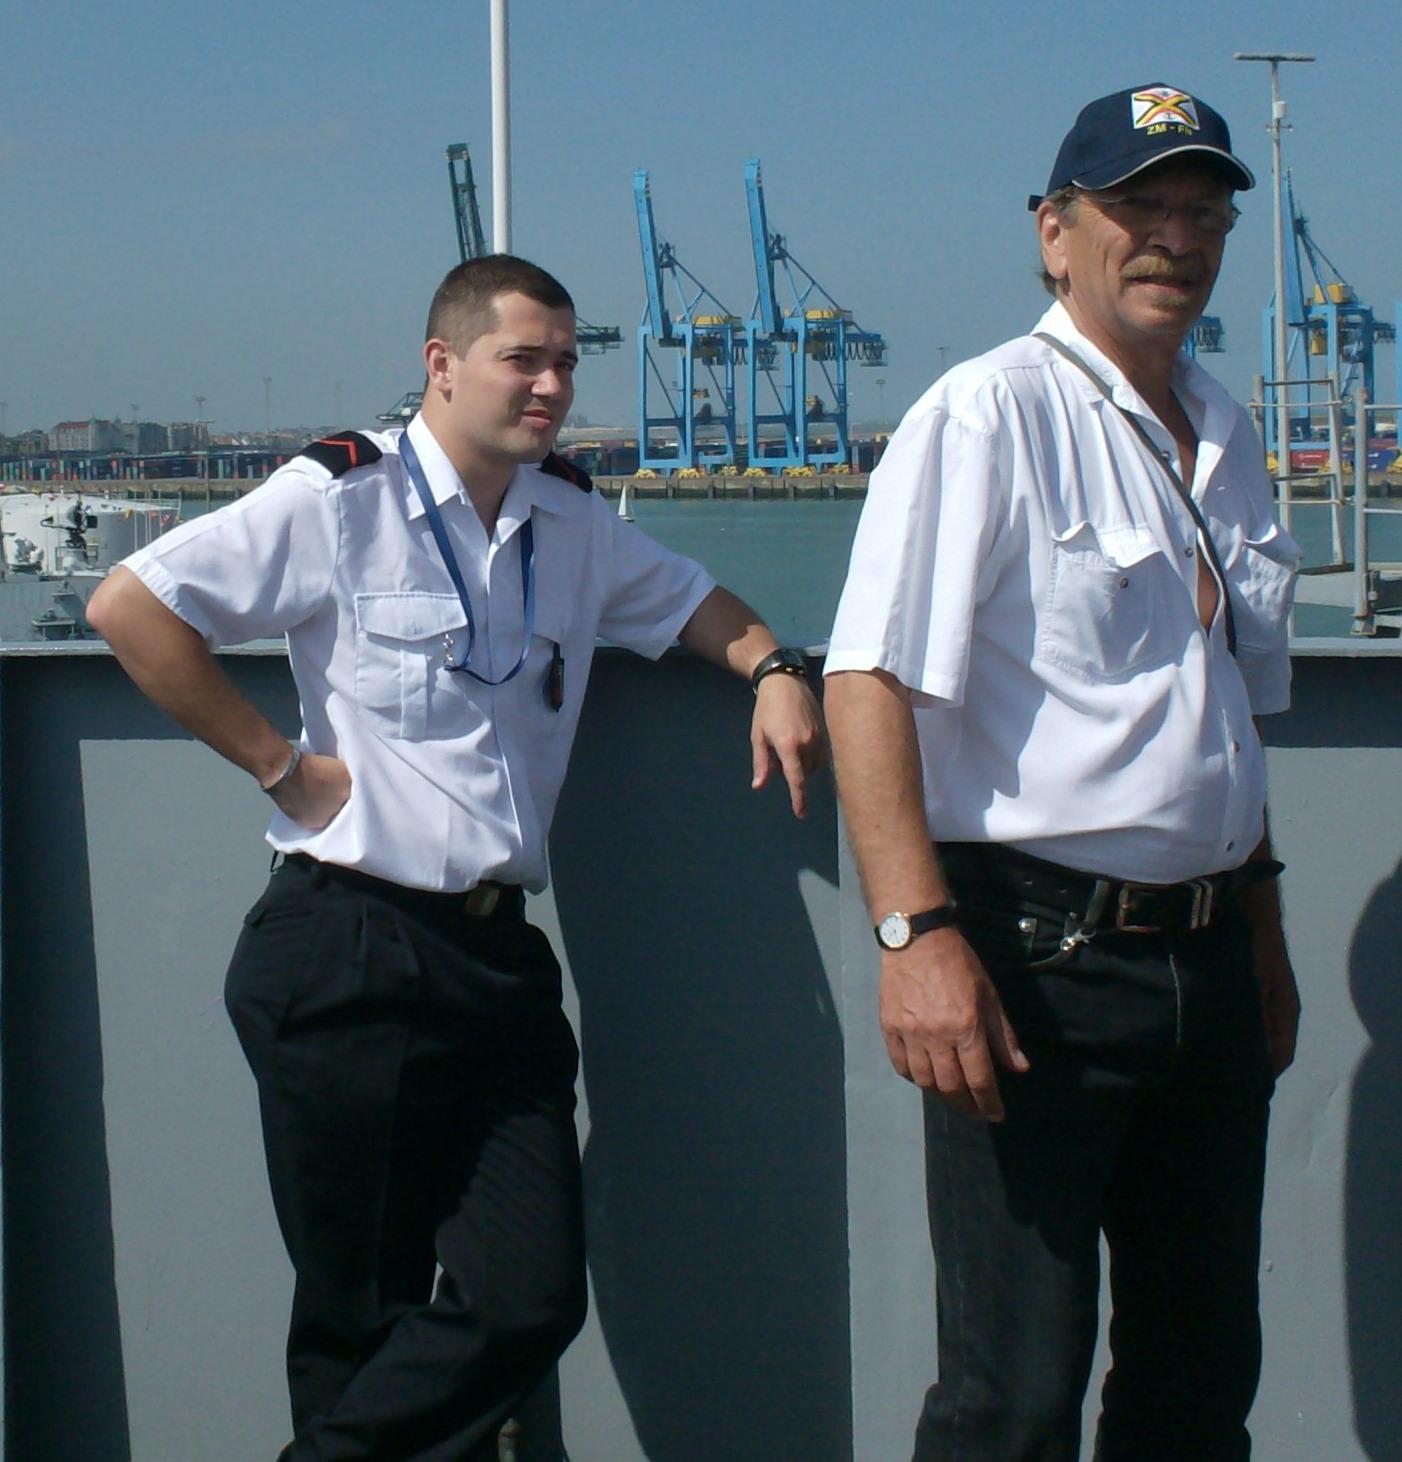 Vos photos du Navy Day 03&04/07/2010  - Page 2 181590HPIM1444